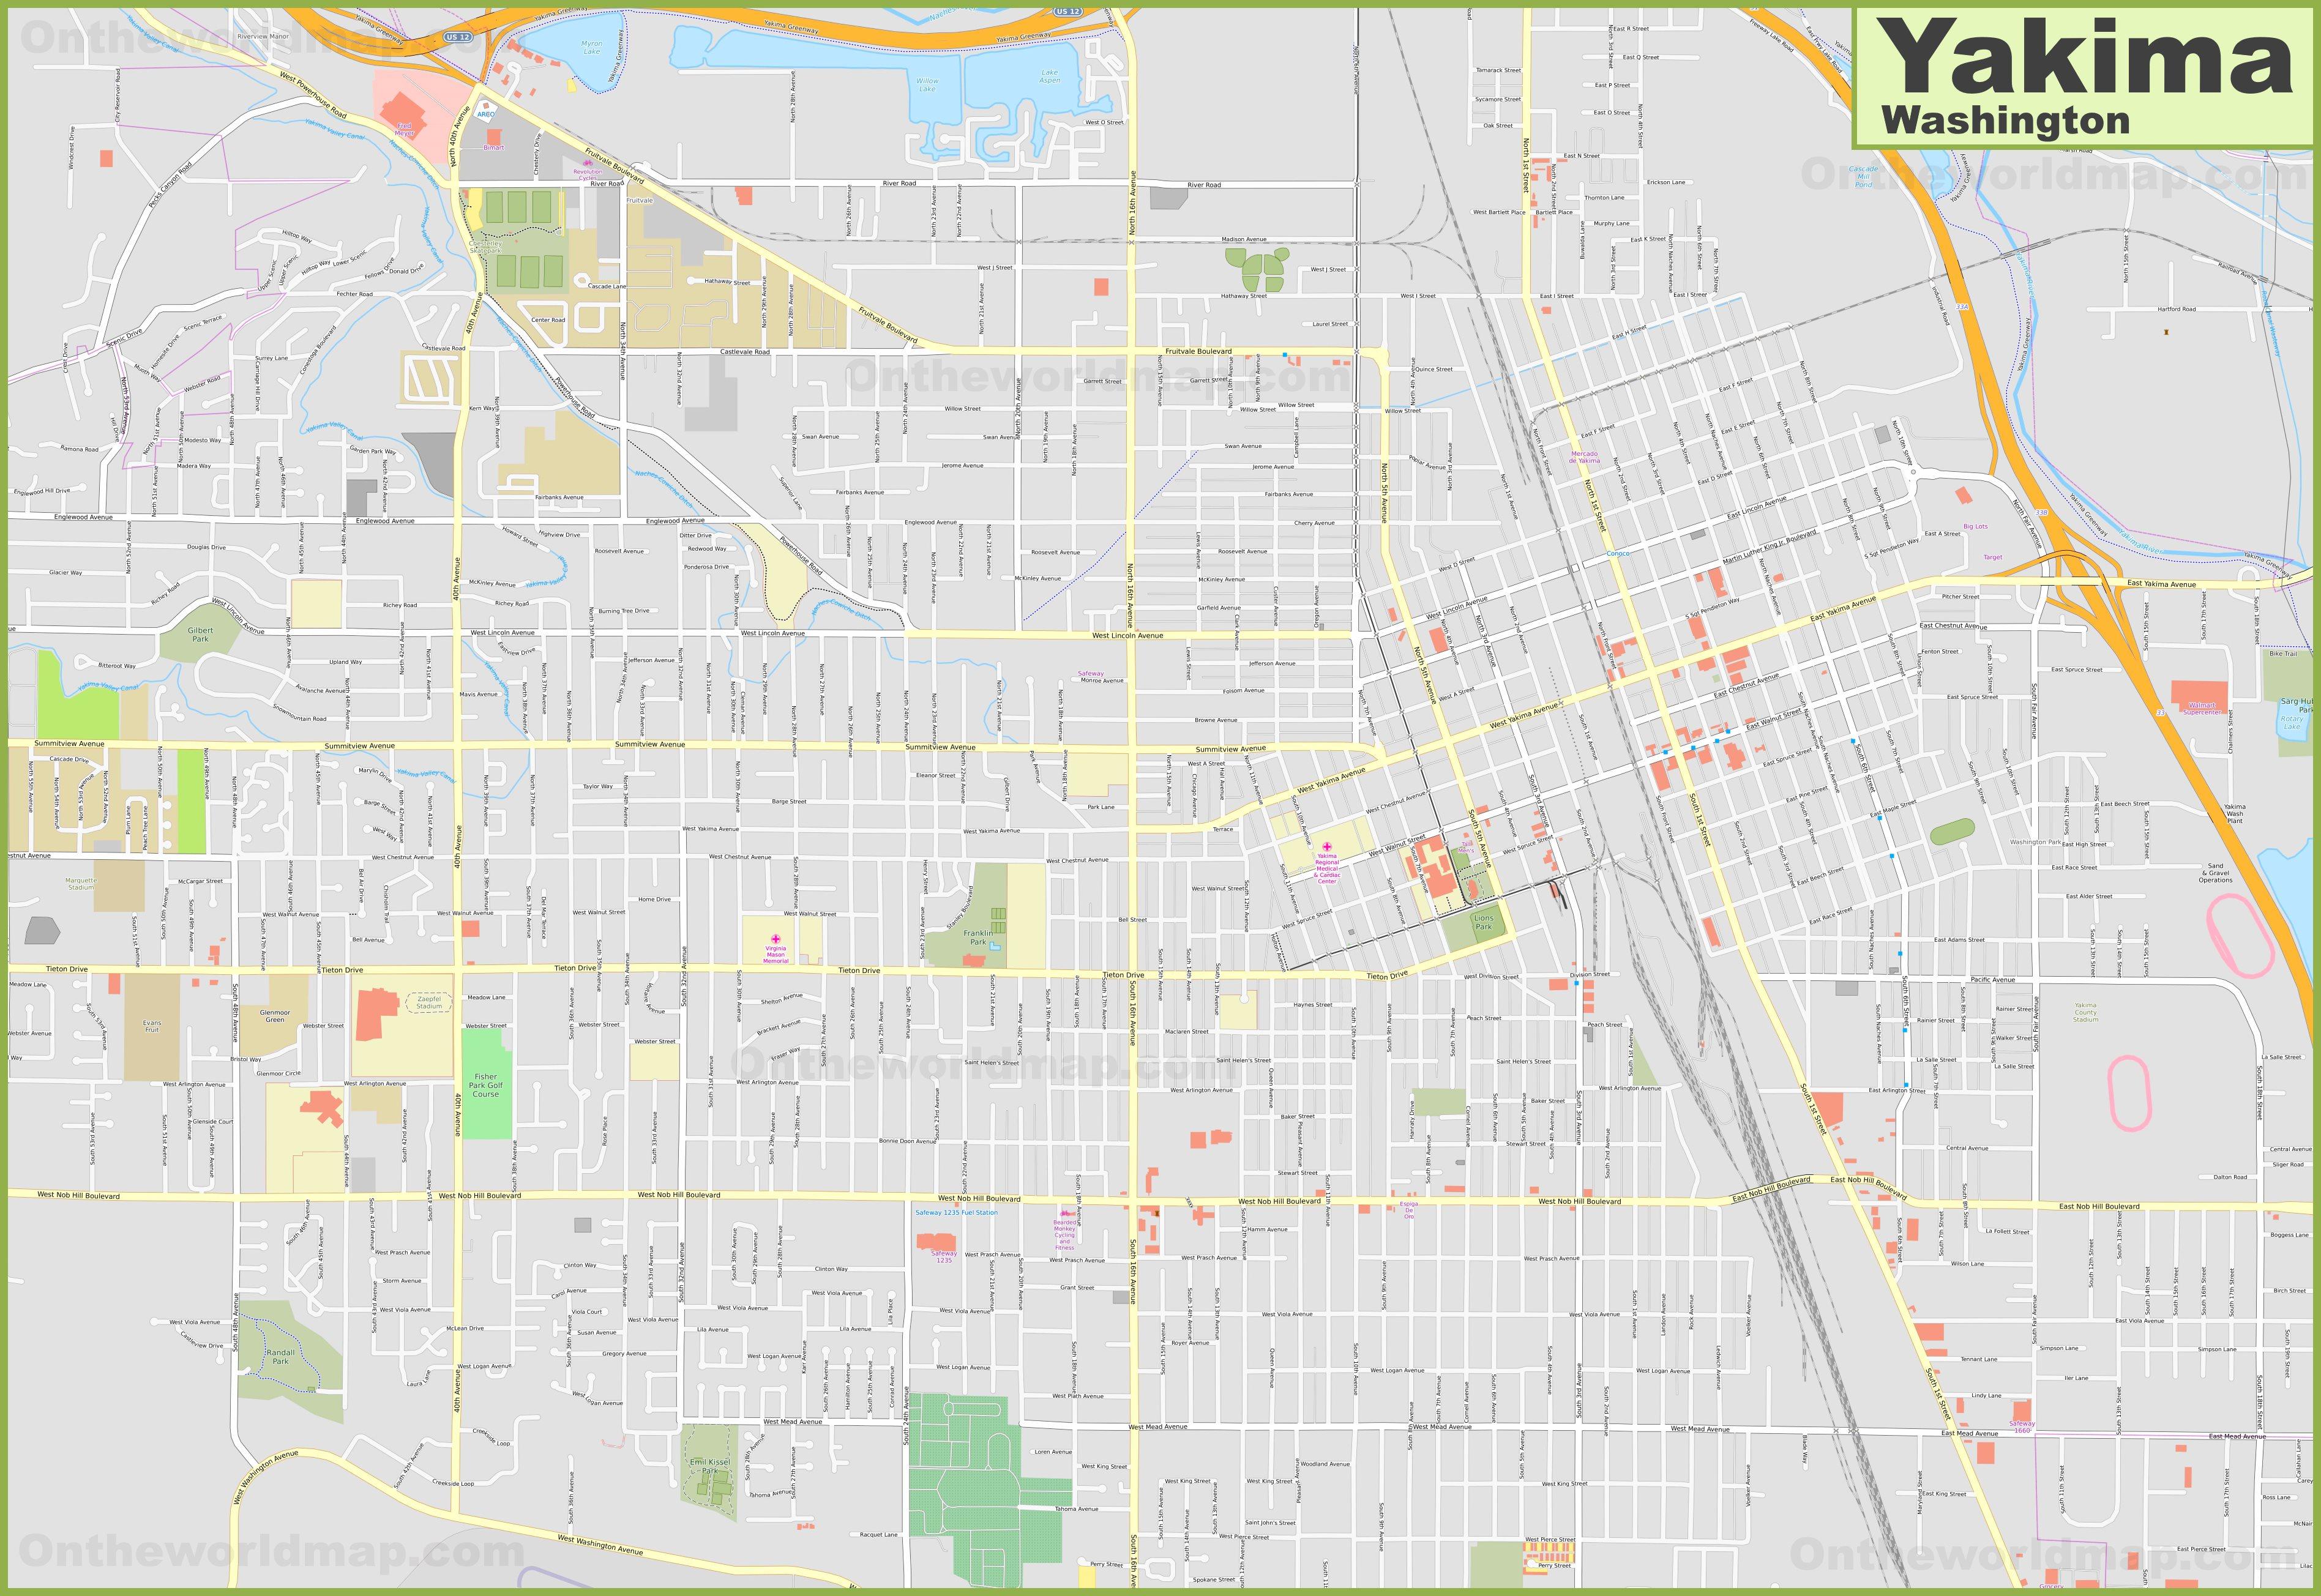 Large detailed map of Yakima on yakima county map detailed, yakima city art, yakima fairgrounds map, yakima wine country map, yakima hotels, hermiston or street map, yakima fire department, little naches orv map, city of yakima zoning map, sunnyside wa street map, ellensburg street map, yakima valley map, yakima tribe map, yakima airport, yakima oregon map, yakima city hall, yakima road map, yakima county on map, yakima firing range map, yakima restaurant map,